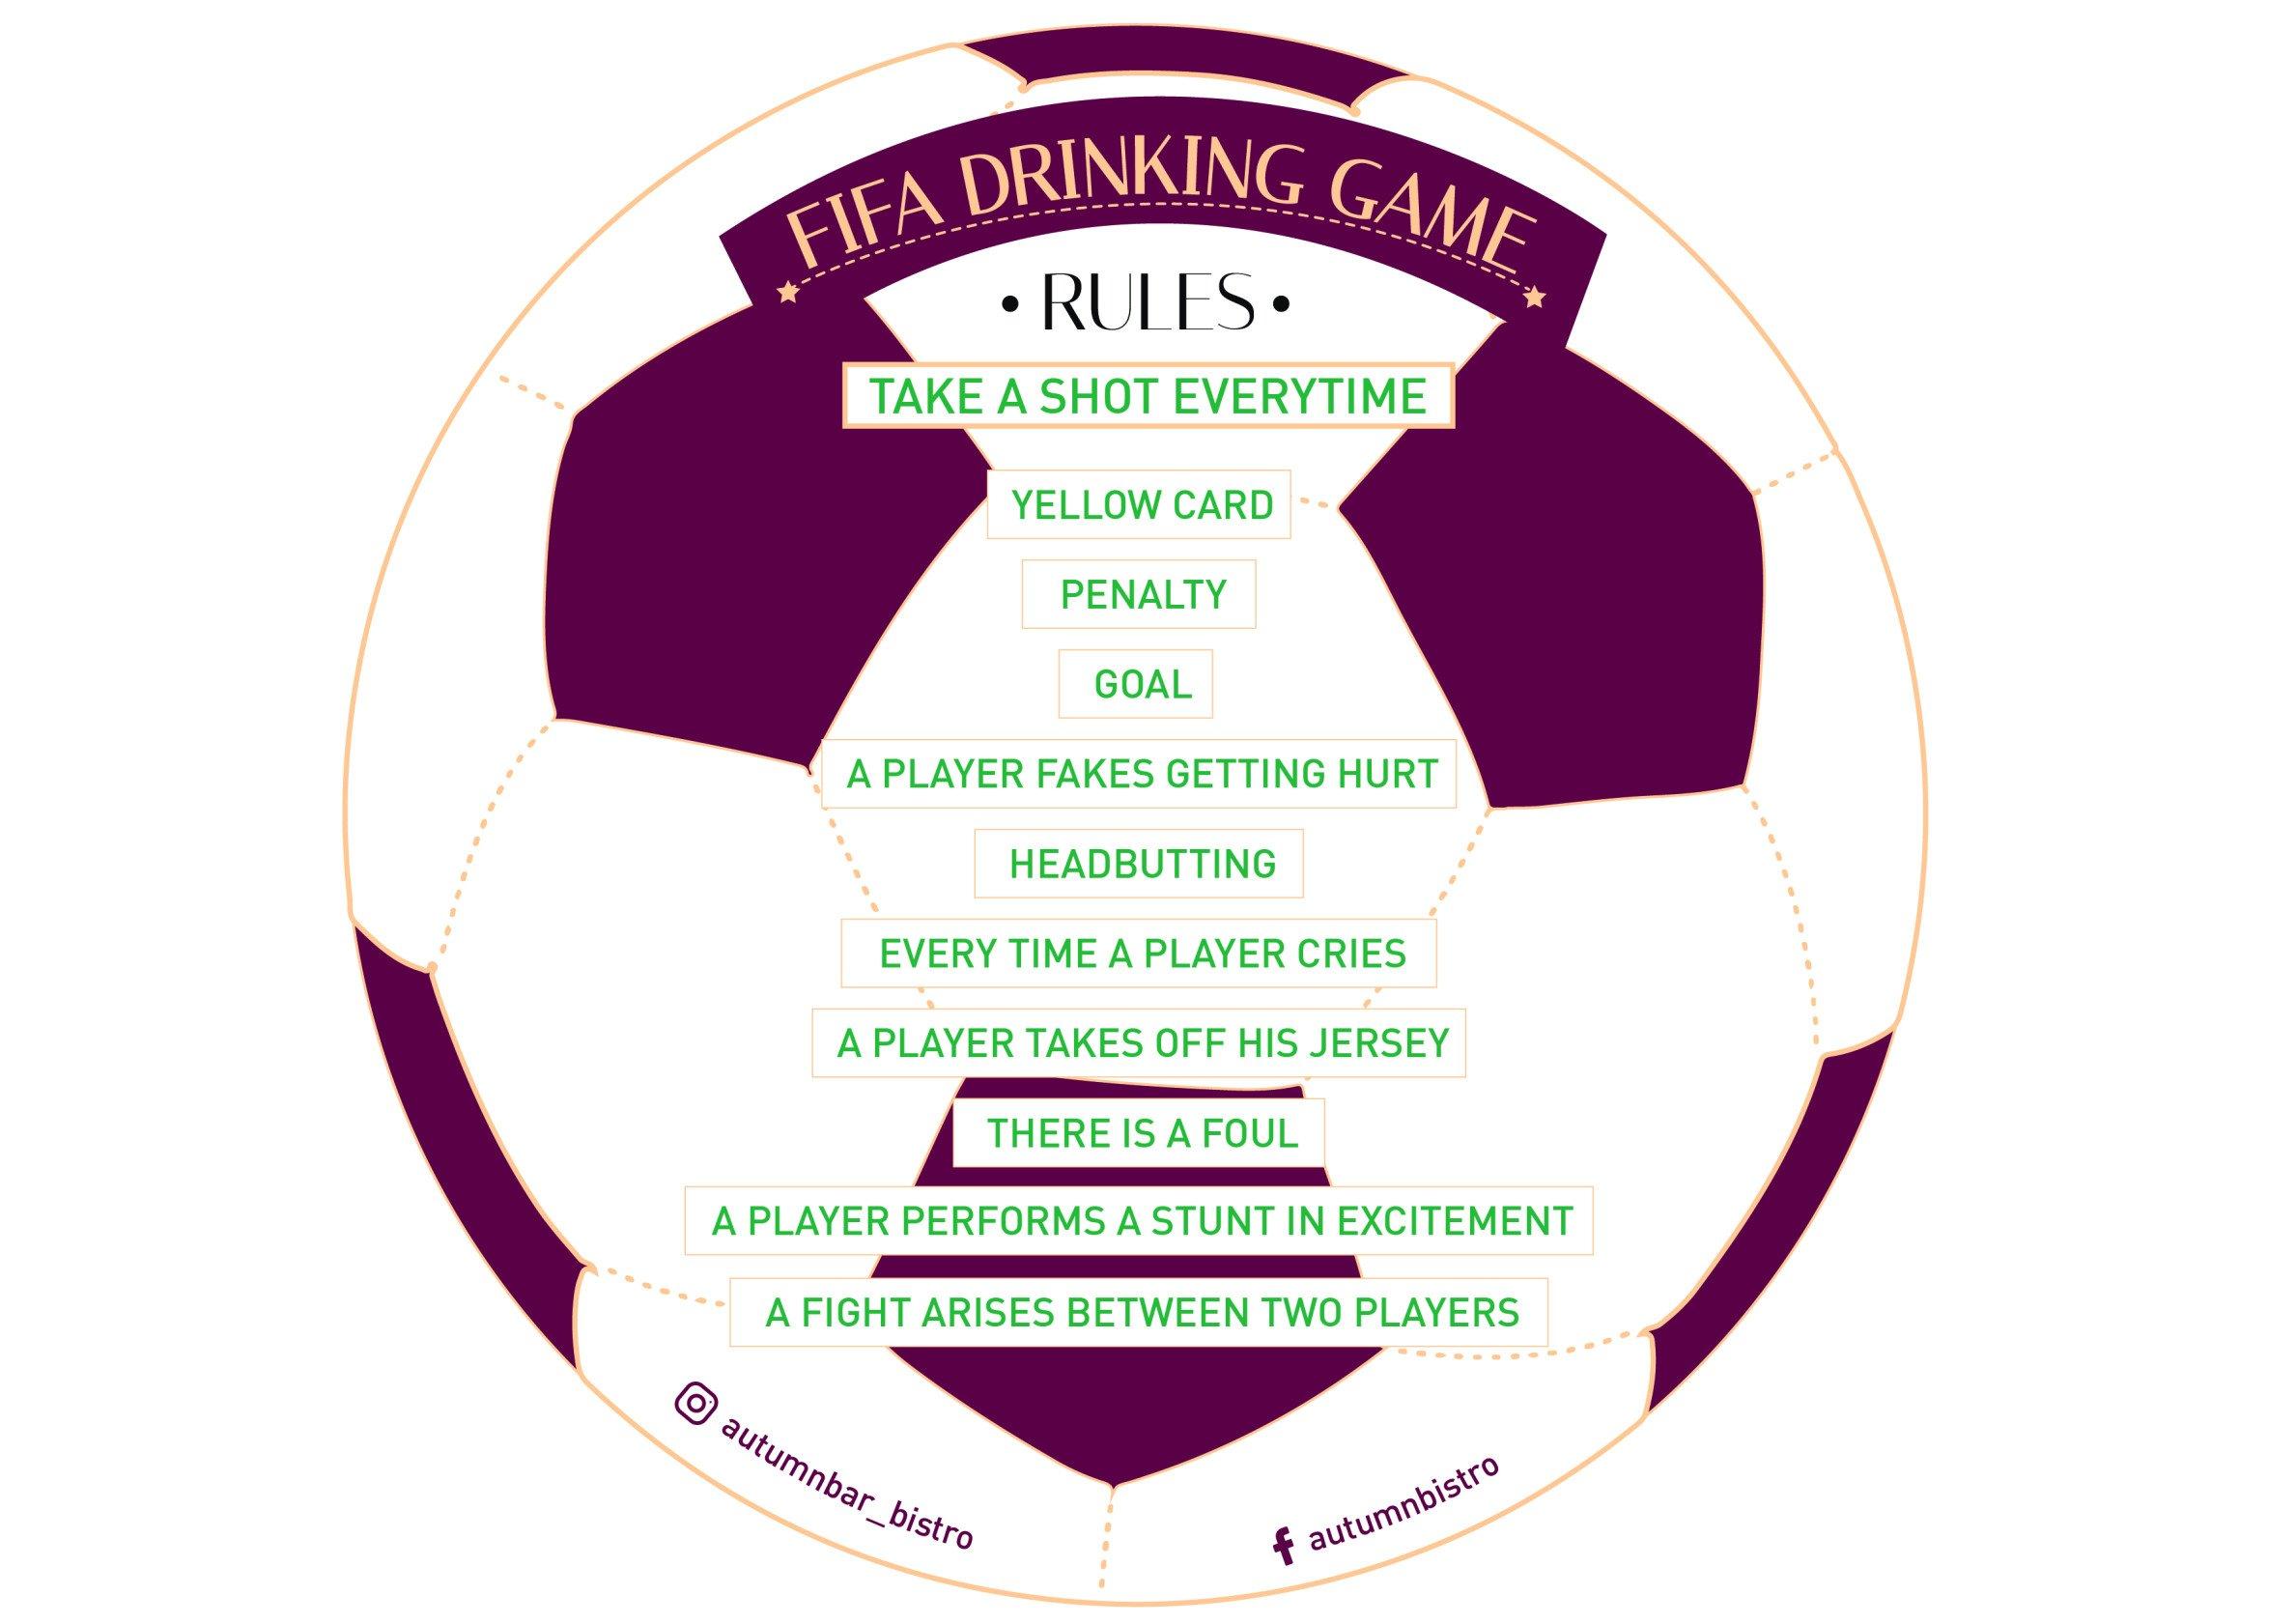 Enjoy FIFA World Cup 2018 in Mumbai at this bistro & bar!